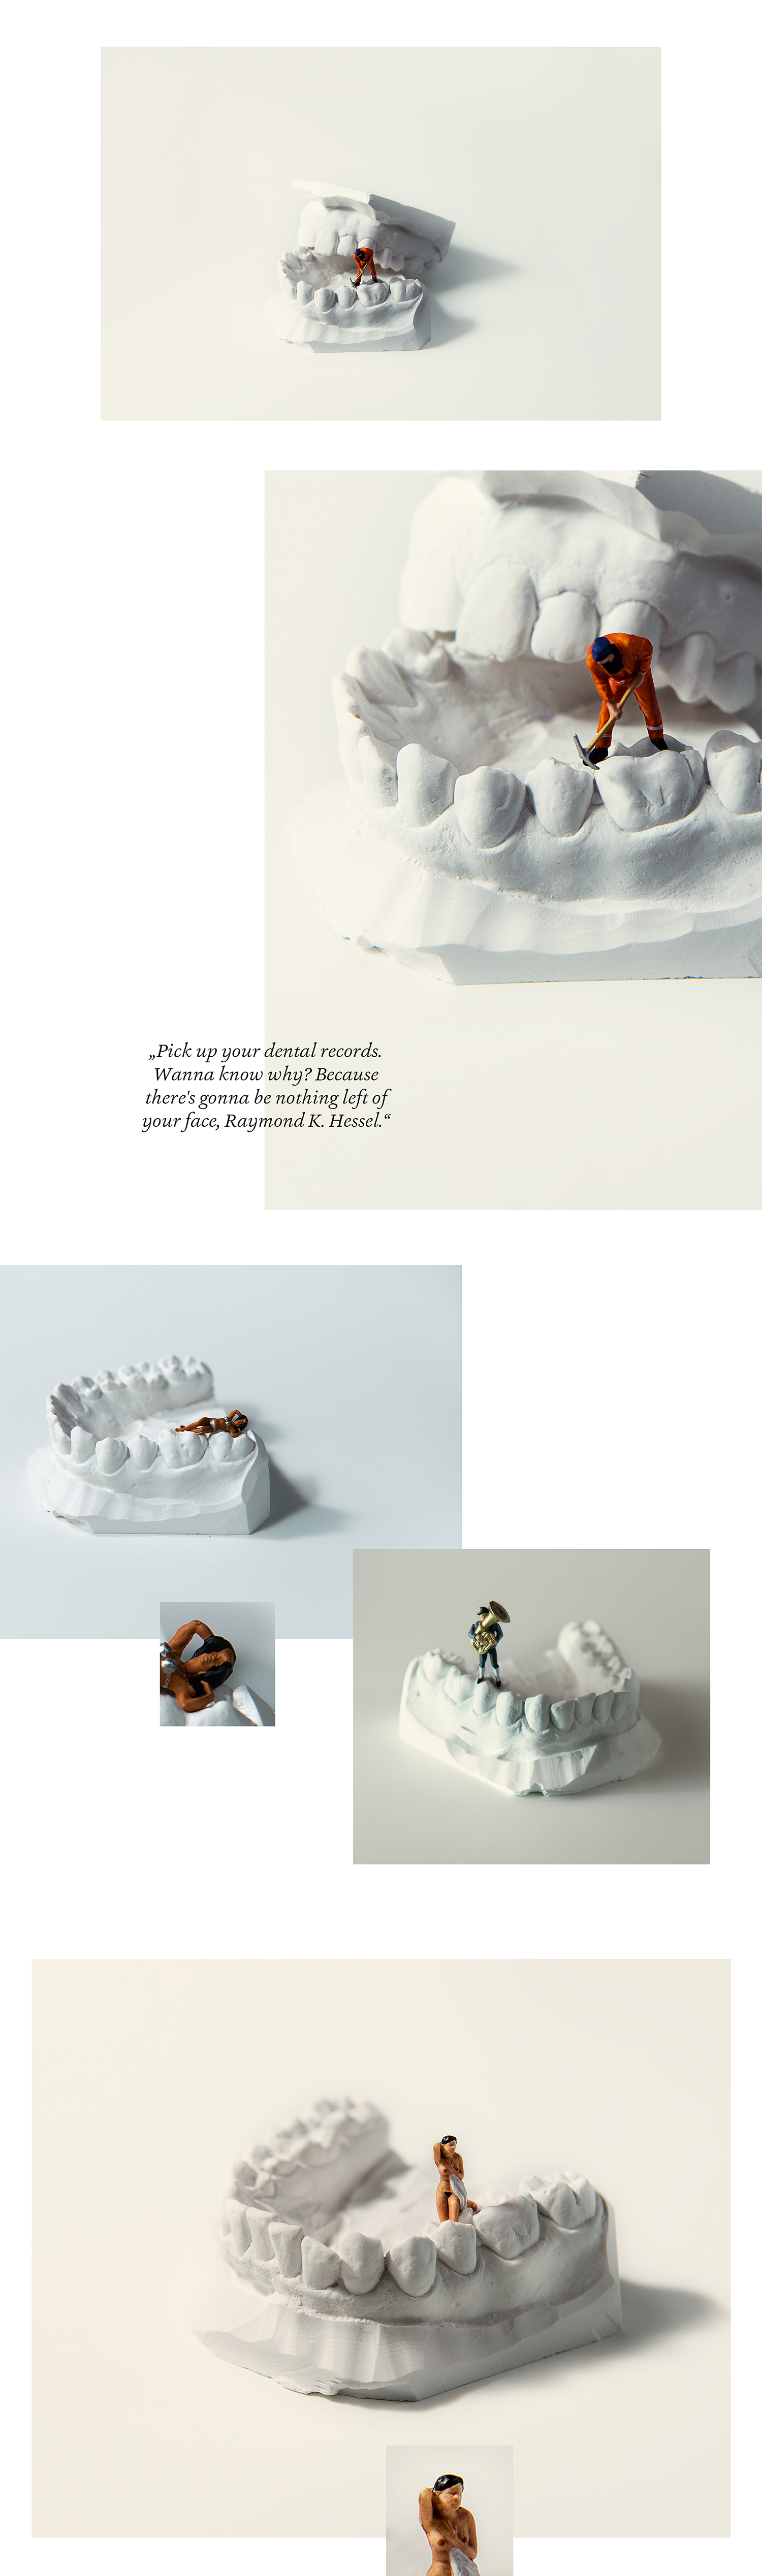 LITTLEONES-02-WEB